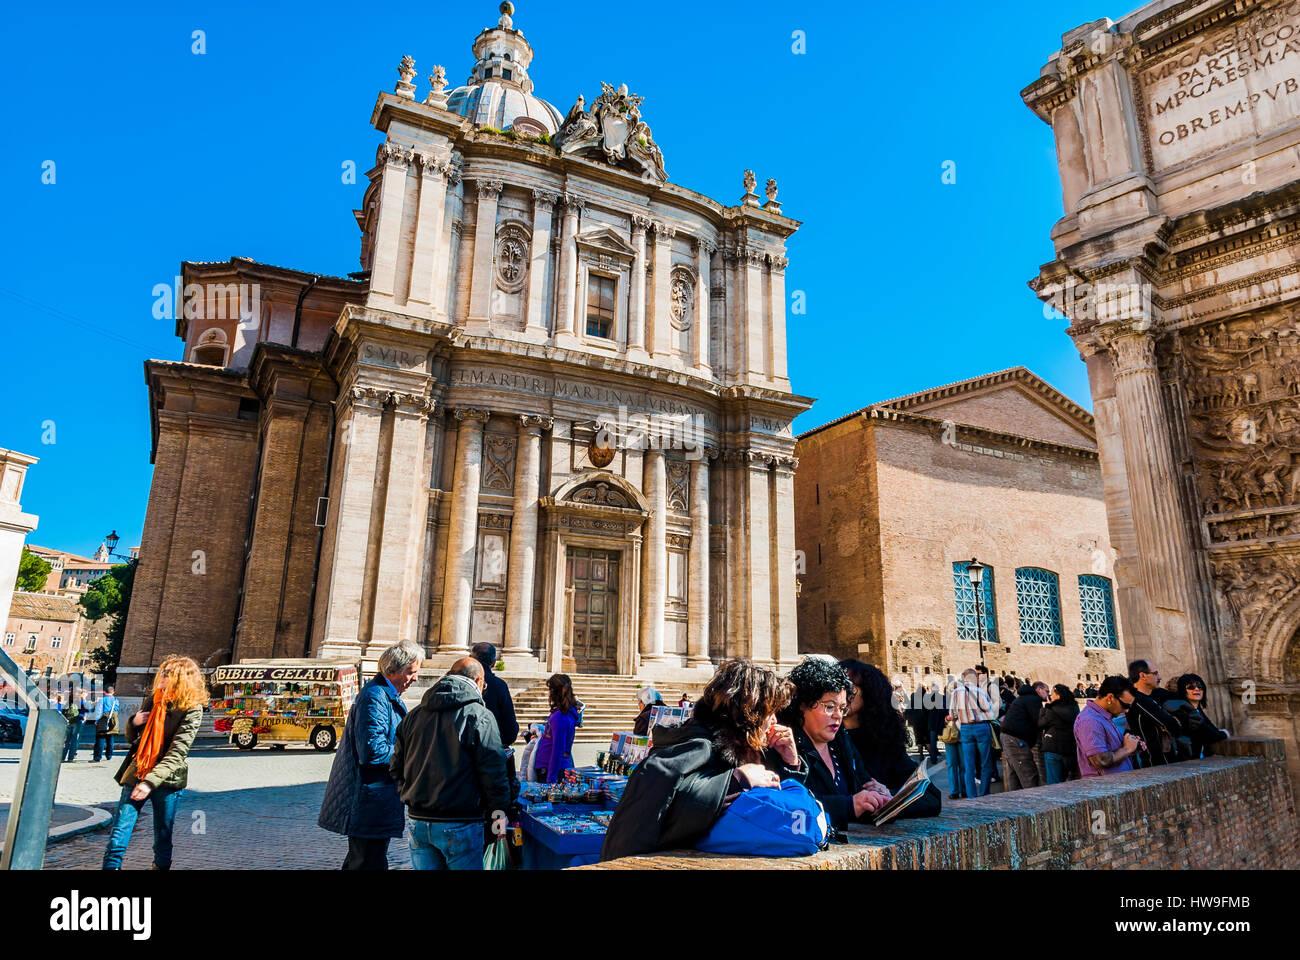 Church of Santi Luca e Martina. Roman Forum. Rome, Lazio, Italy, Europe - Stock Image